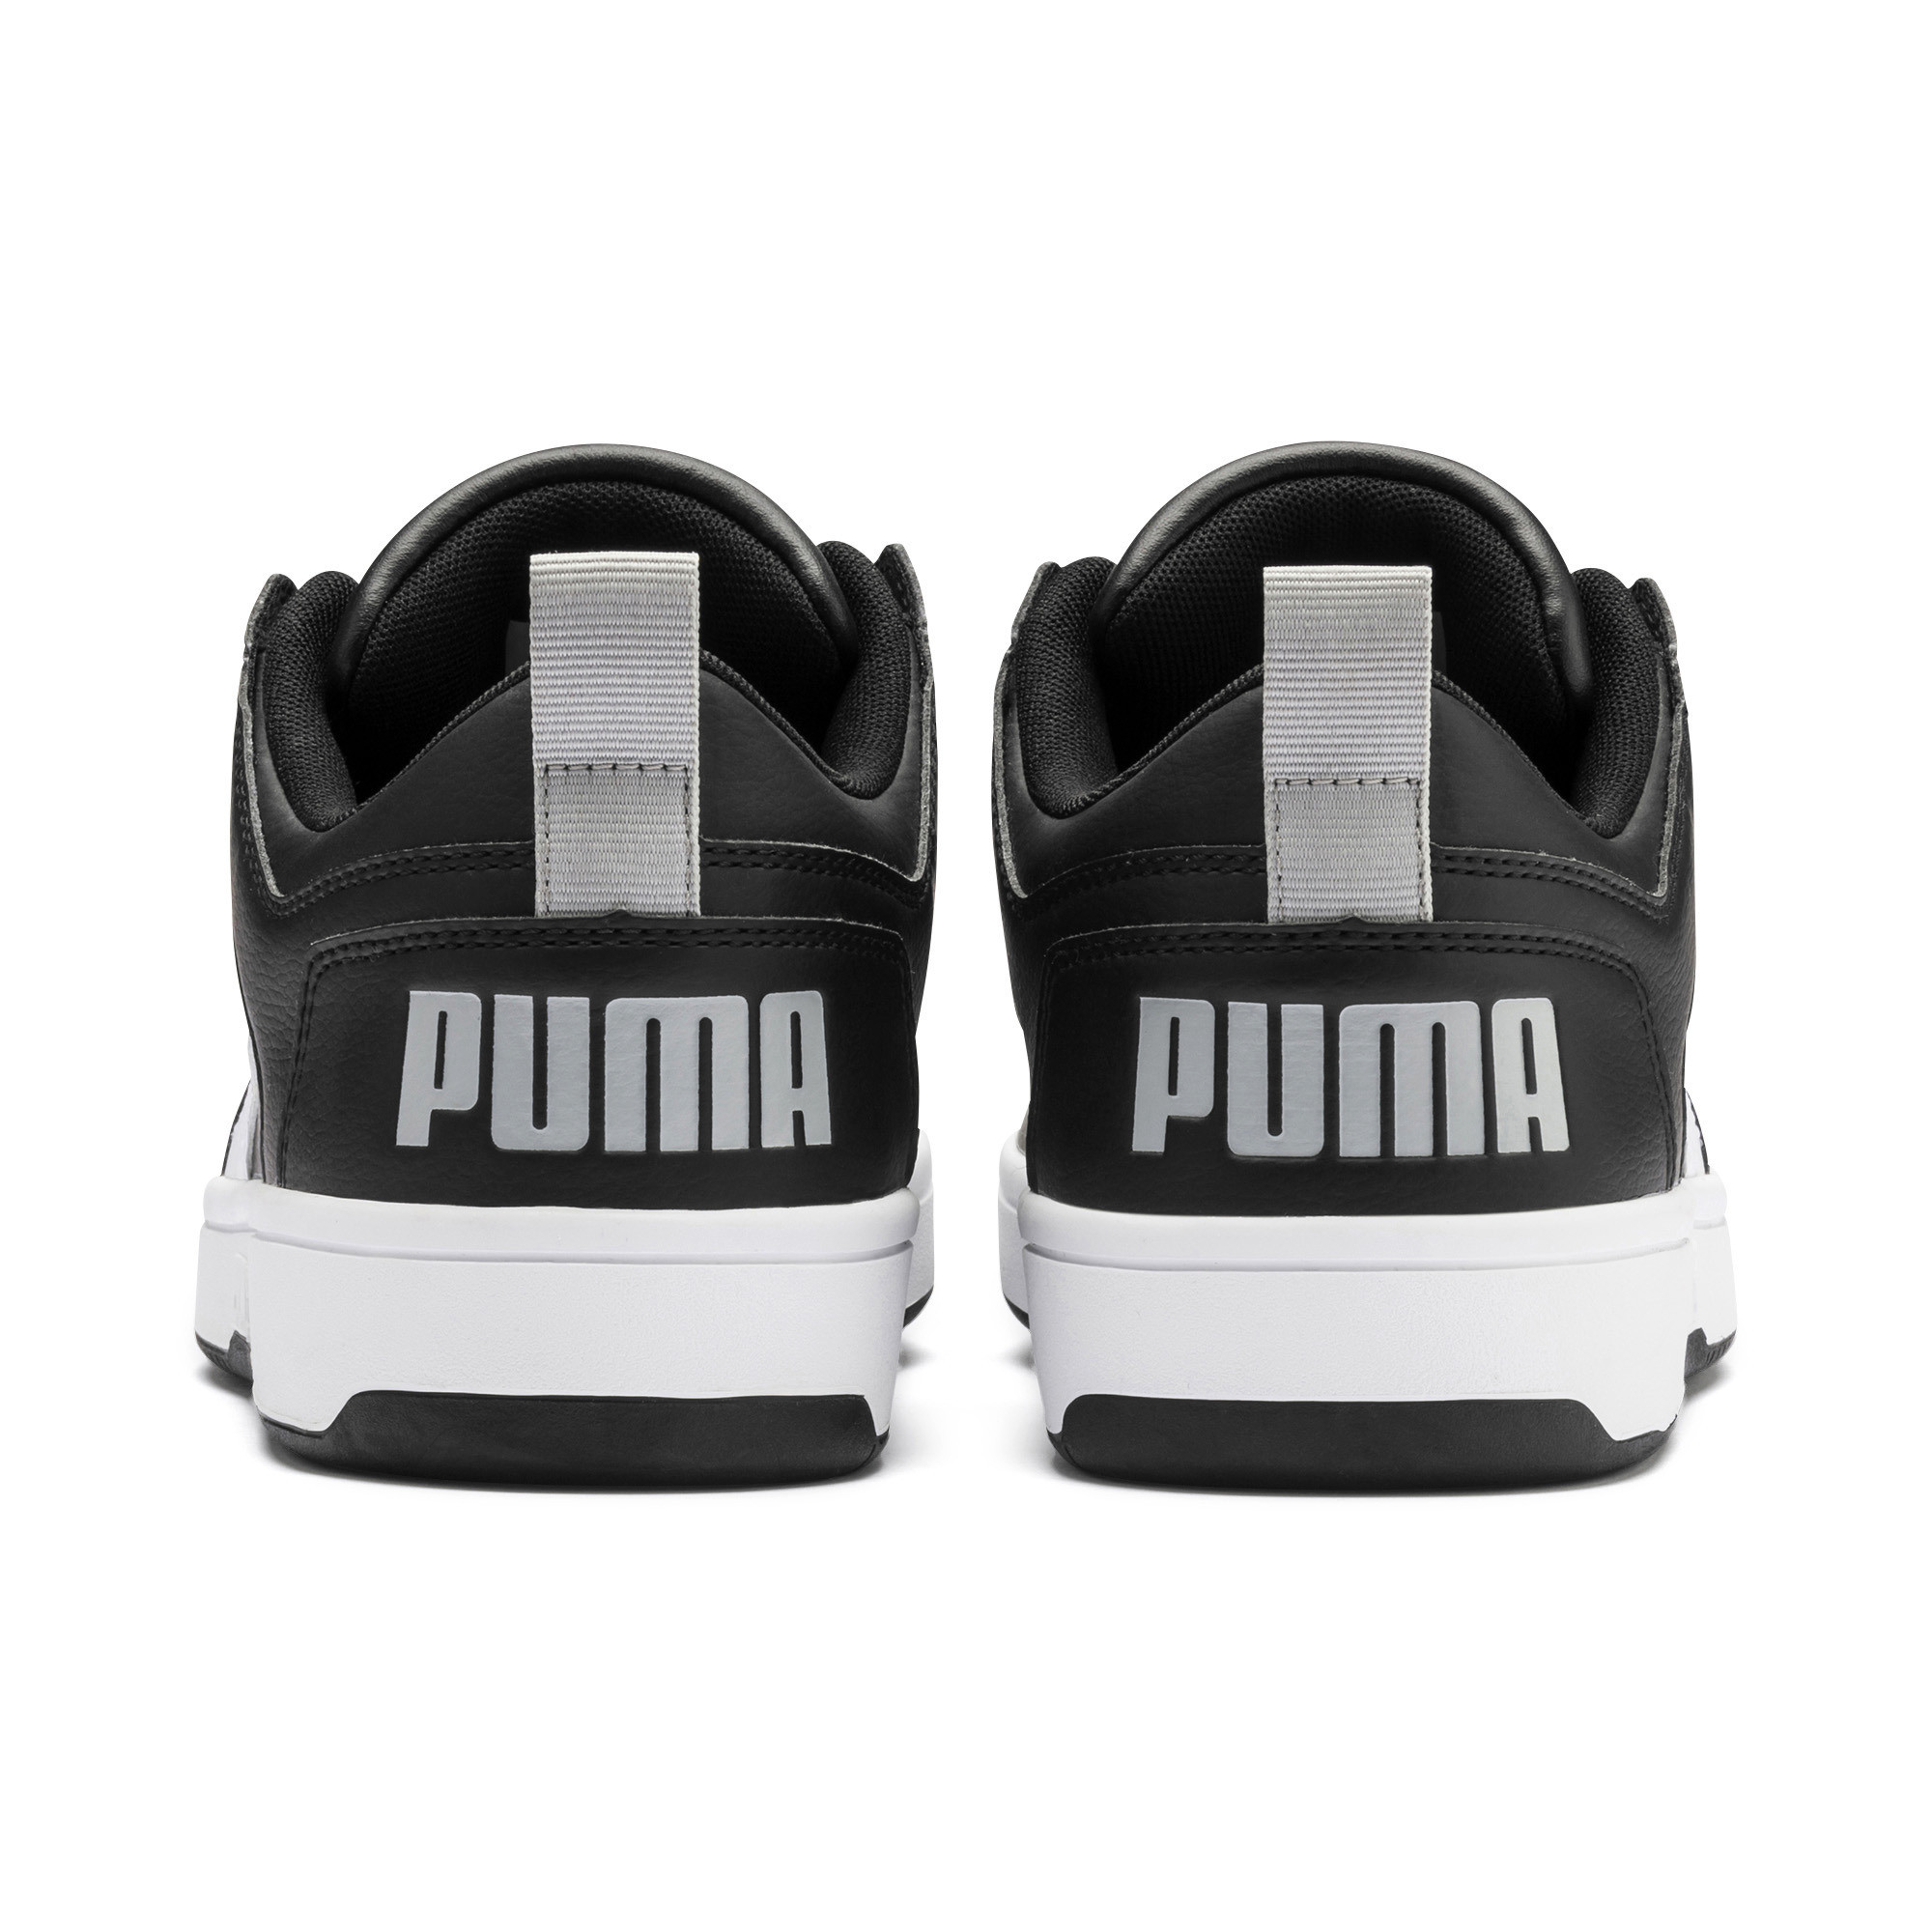 PUMA-PUMA-Rebound-LayUp-Lo-Men-039-s-Sneakers-Men-Shoe-Basics miniatura 8